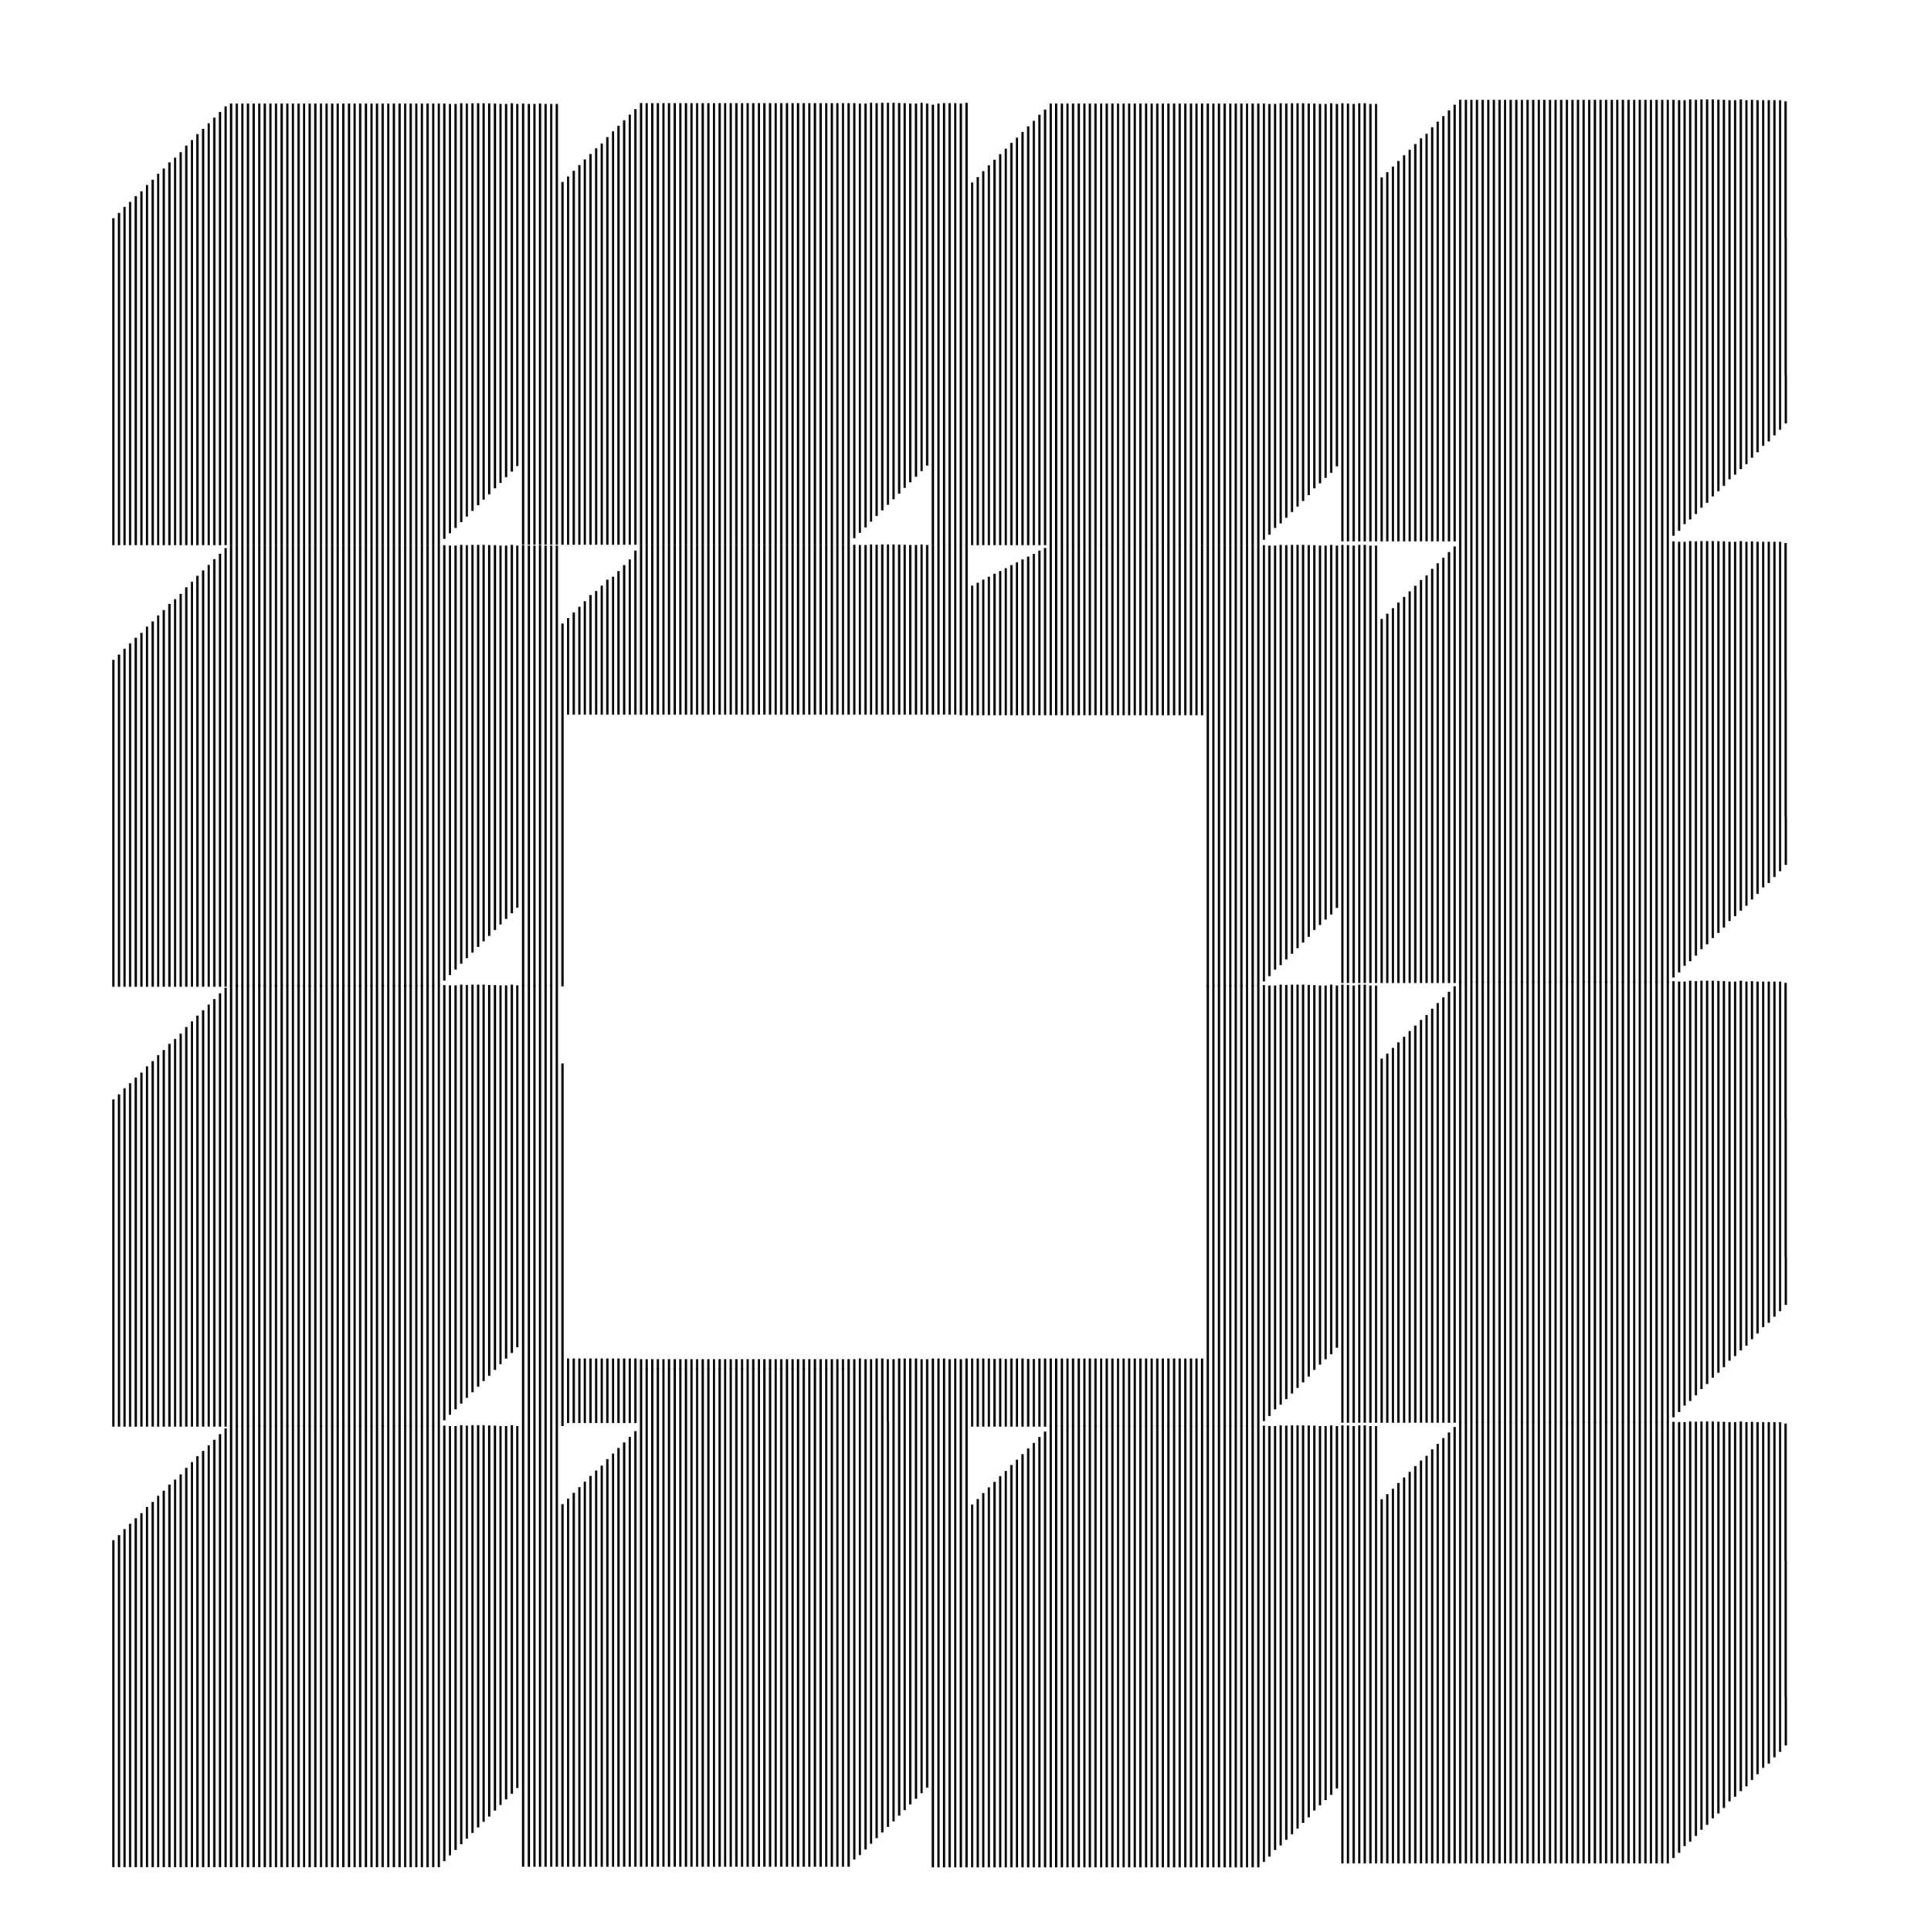 nuclear-_Artboard 6 copy.png